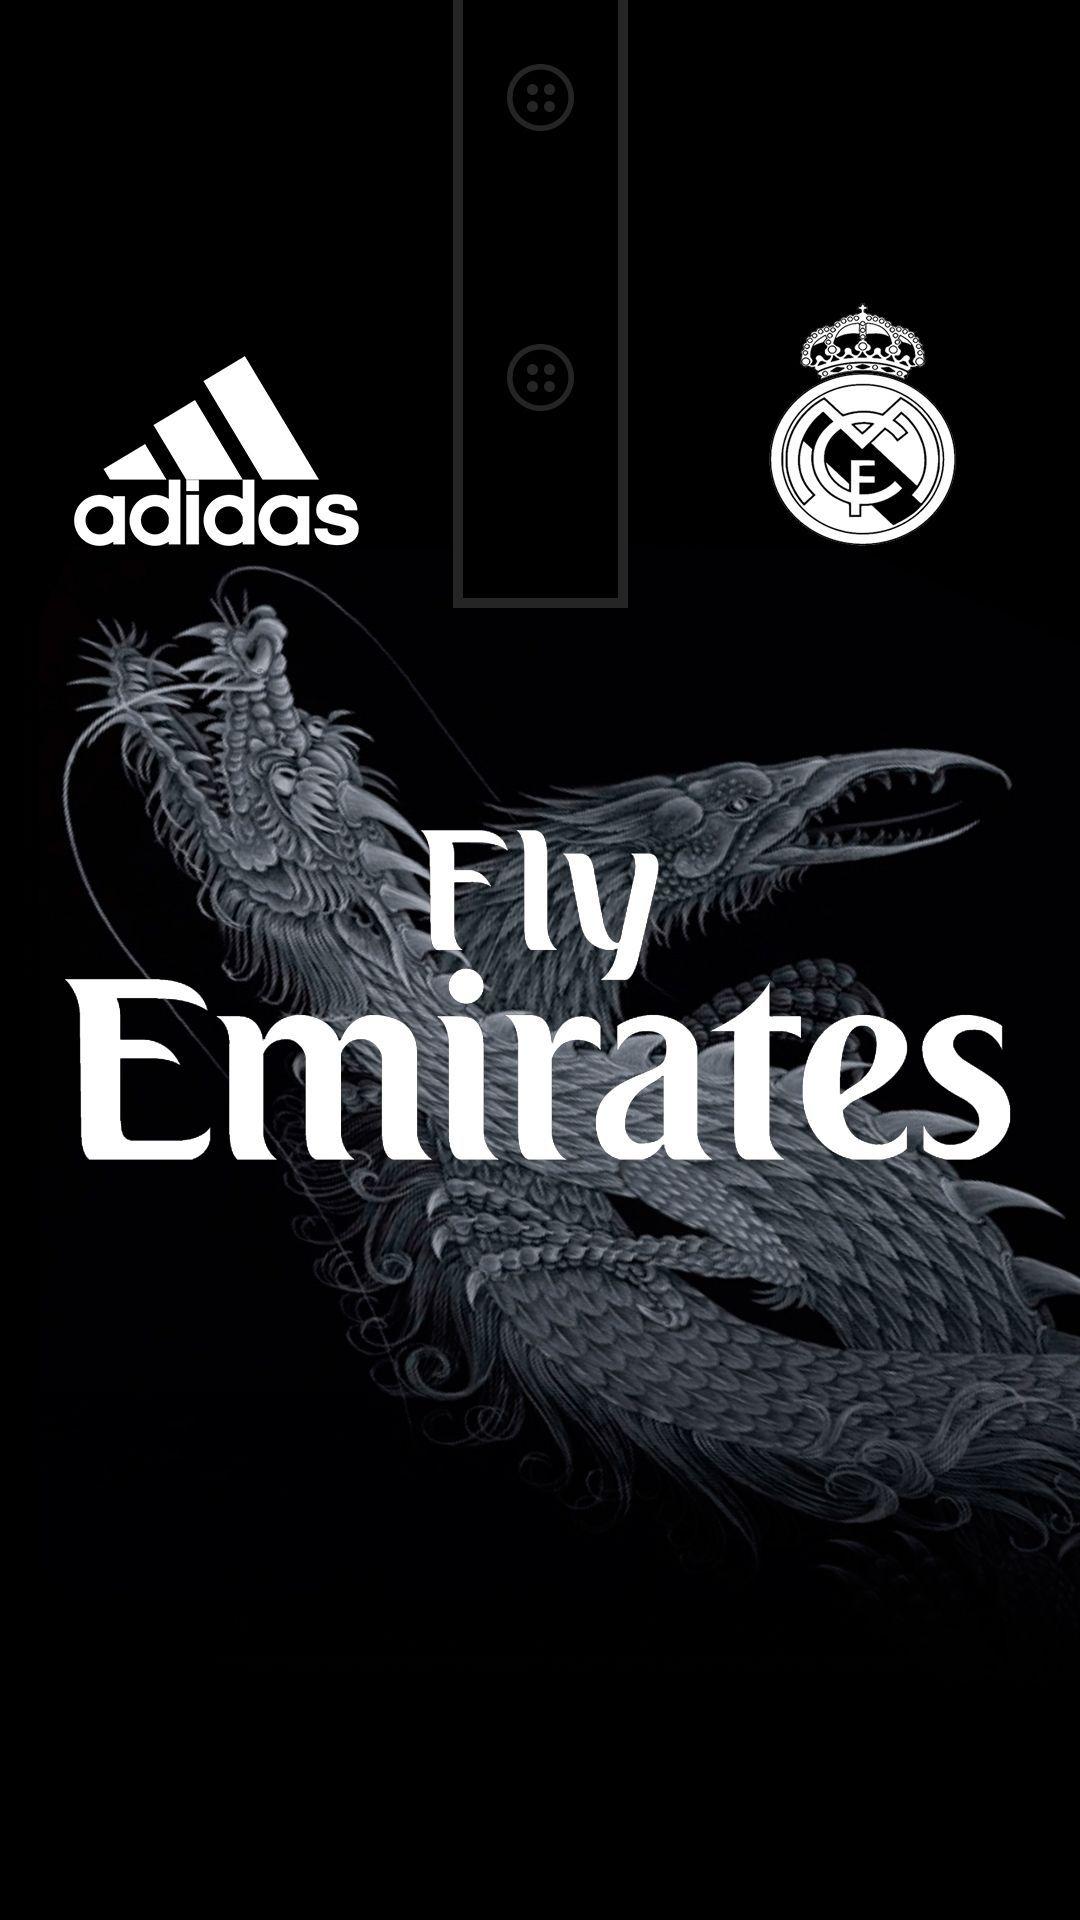 22 Real Madrid Best Mobile Adidas Wallpaper On Wallpapersafari Camisas De Futebol Camisa De Futebol Wallpaper De Futebol